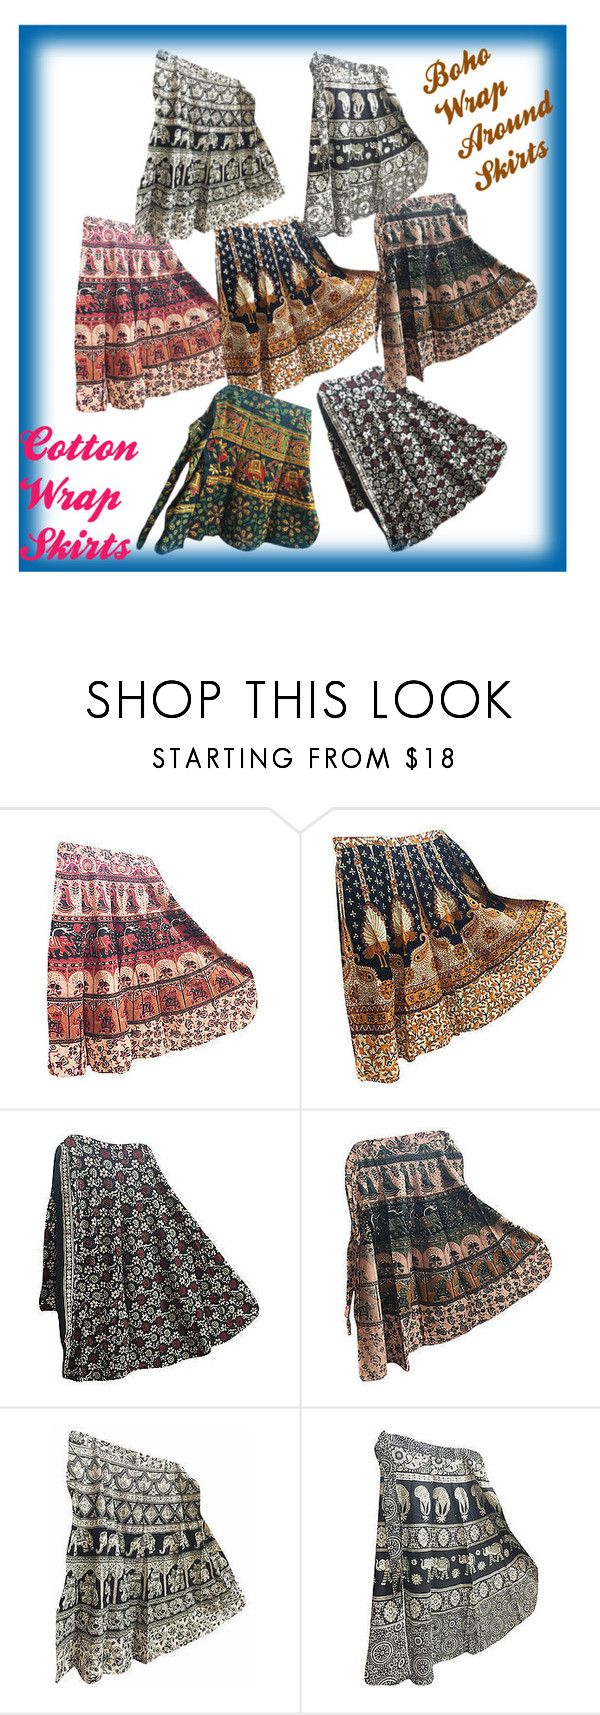 Bohemian Women's Cotton Wrap Around Skirts by baydeals on Polyvore  http://stores.ebay.com/mogulgallery/Wrap-Skirt-/_i.html?_fsub=678282119&_sid=3781319&_trksid=p4634.c0.m322